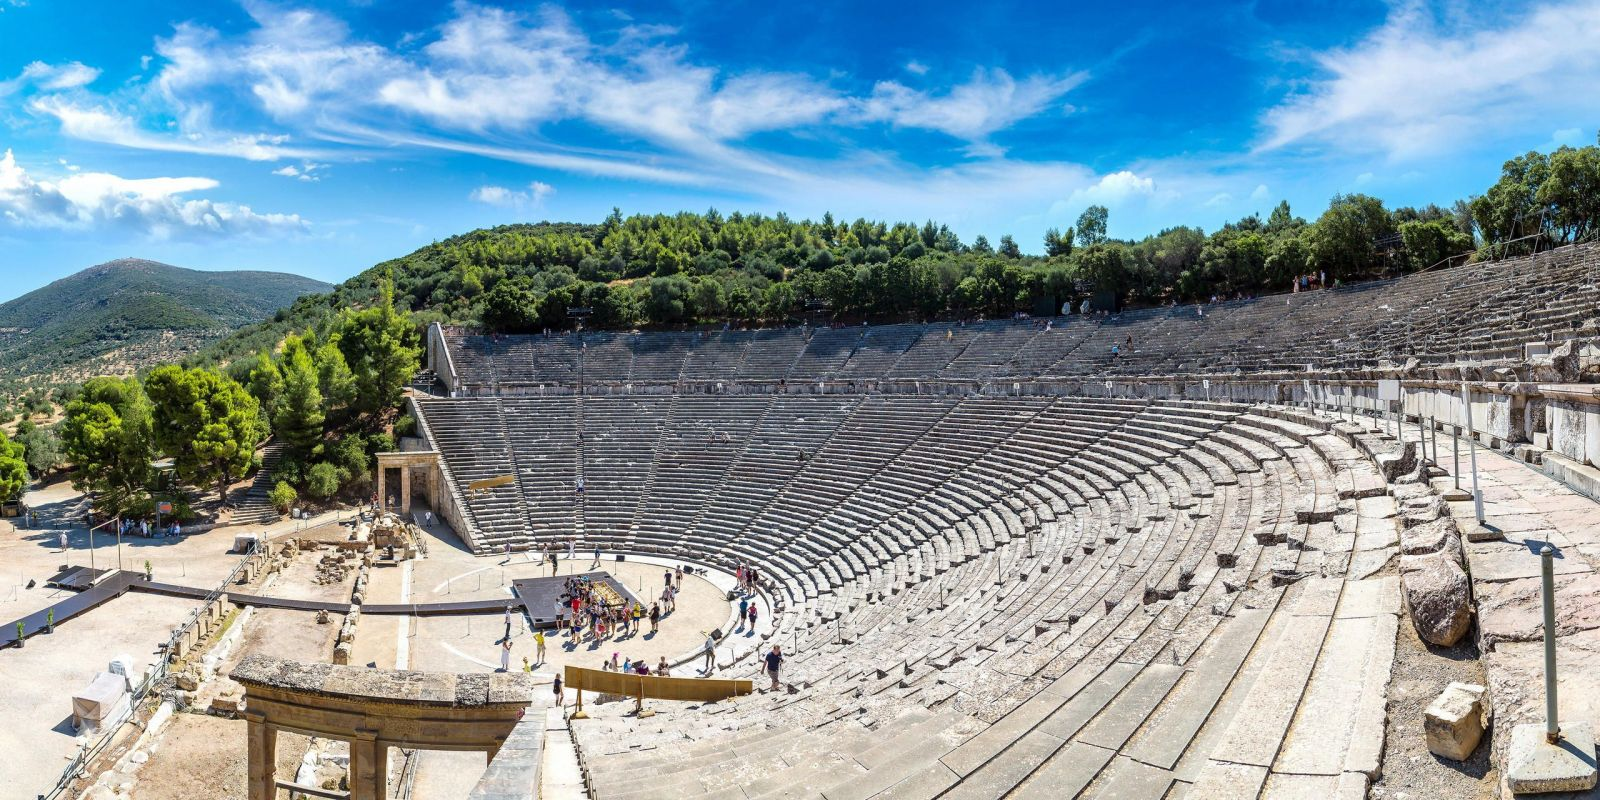 Epidaurus, Greece - Monterrasol small group tours to Epidaurus, Greece. Travel agency offers small group car tours to see Epidaurus in Greece. Order small group tour to Epidaurus with departure date on request.